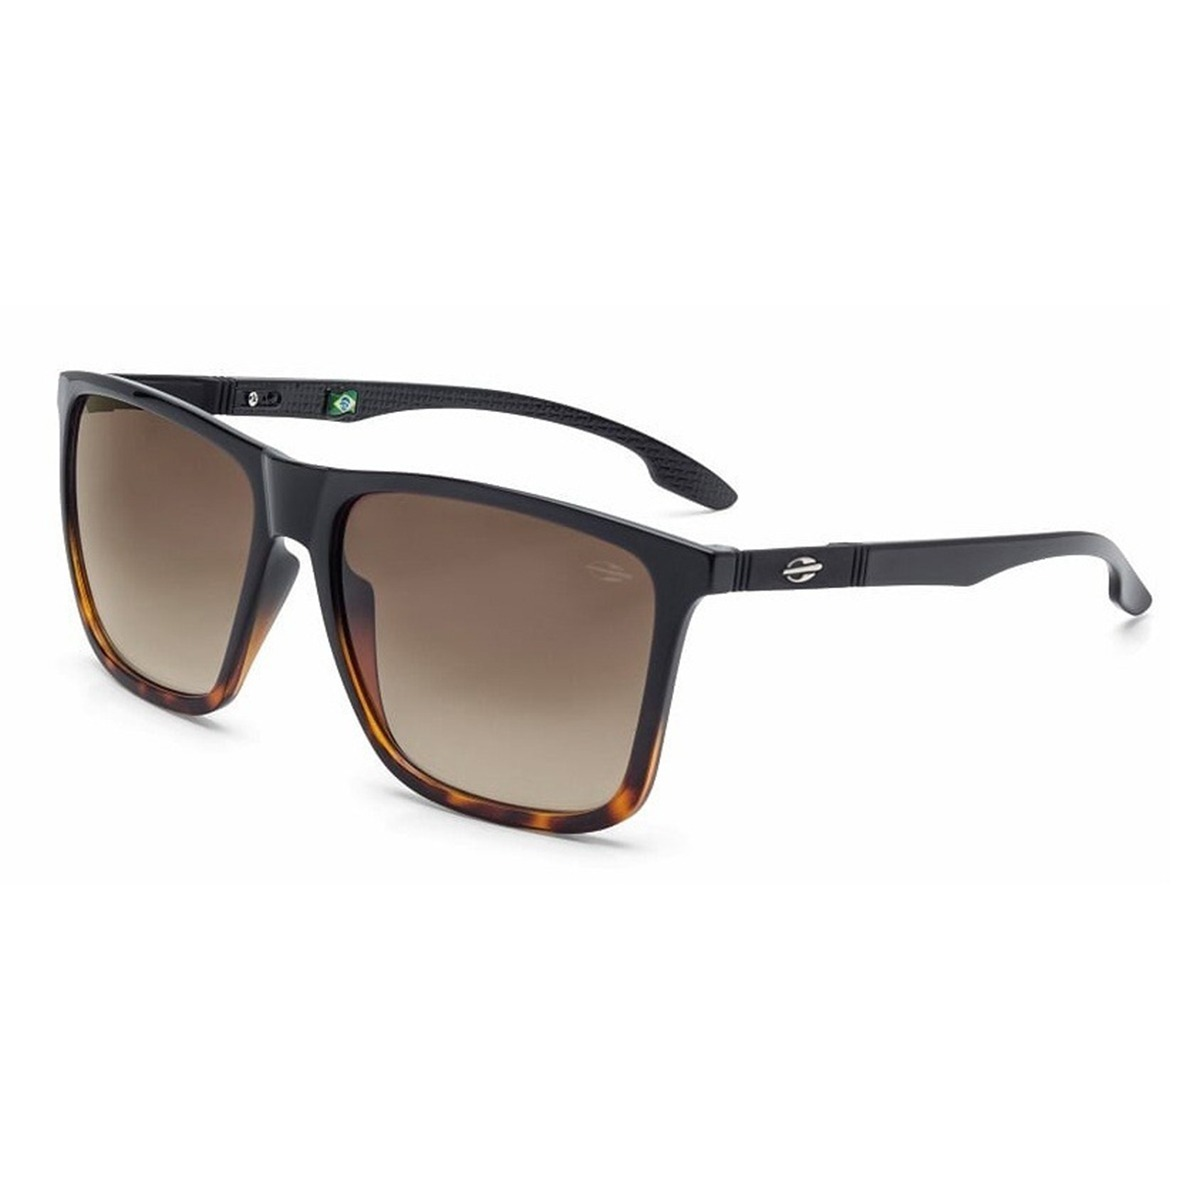 fa465968baf74 Oculos Sol Masculino Mormaii Hawaii Preto Degrade Marrom - R  289